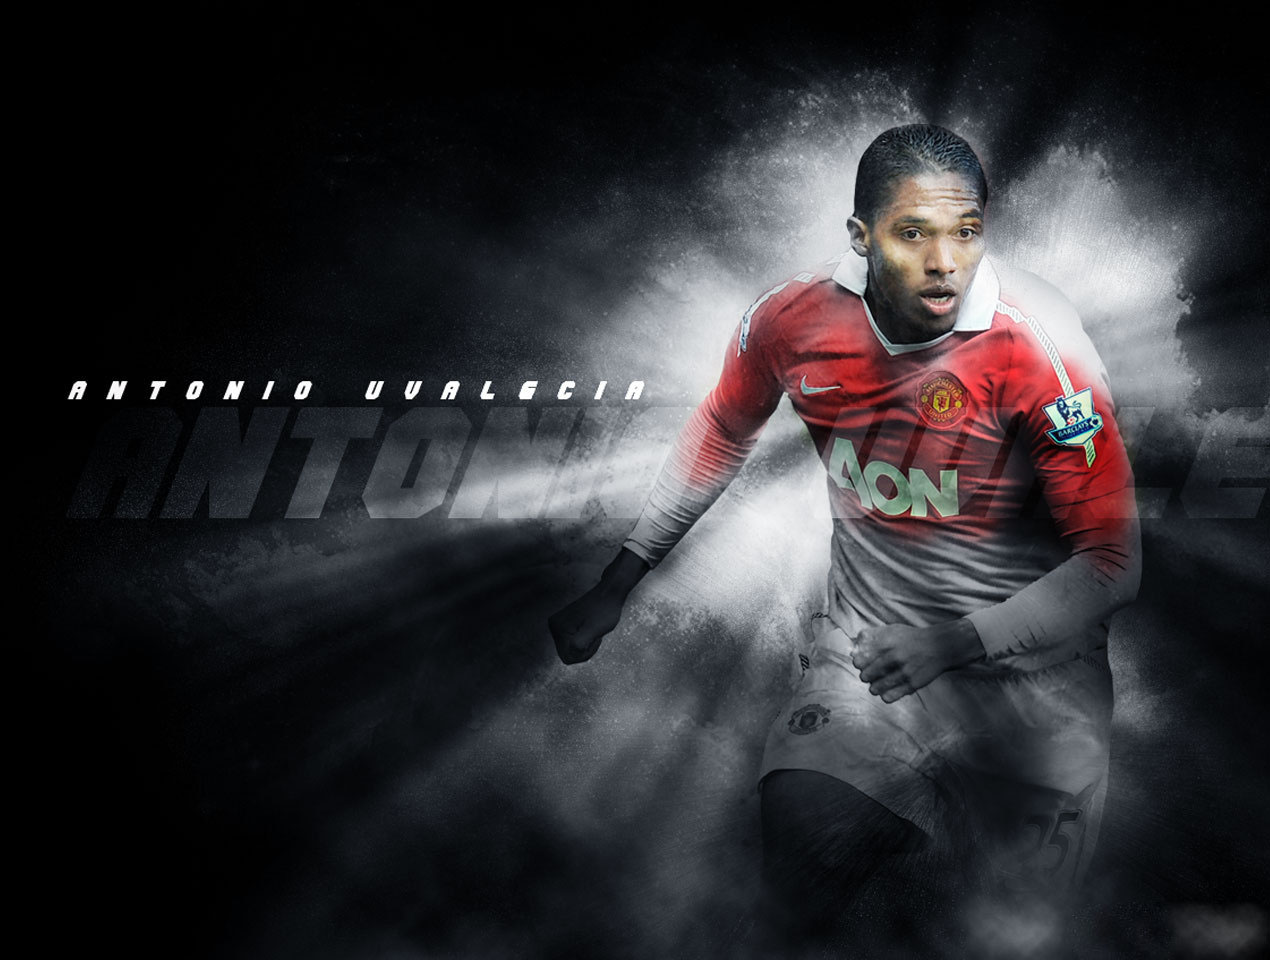 Best Football Wallpapers: Antonio